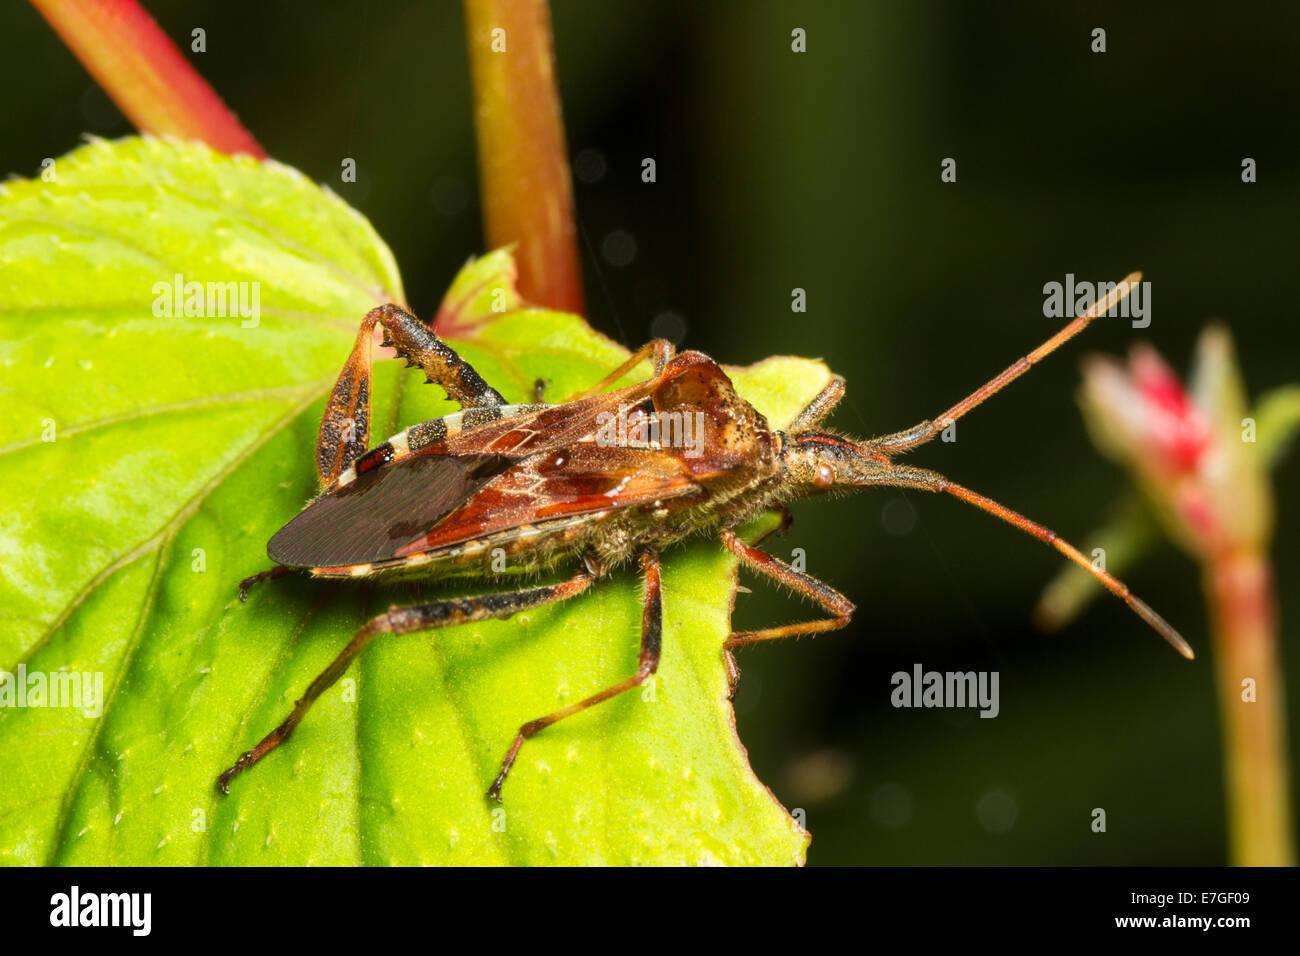 Adult Western conifer seed bug, Leptoglossus occidentalis - Stock Image